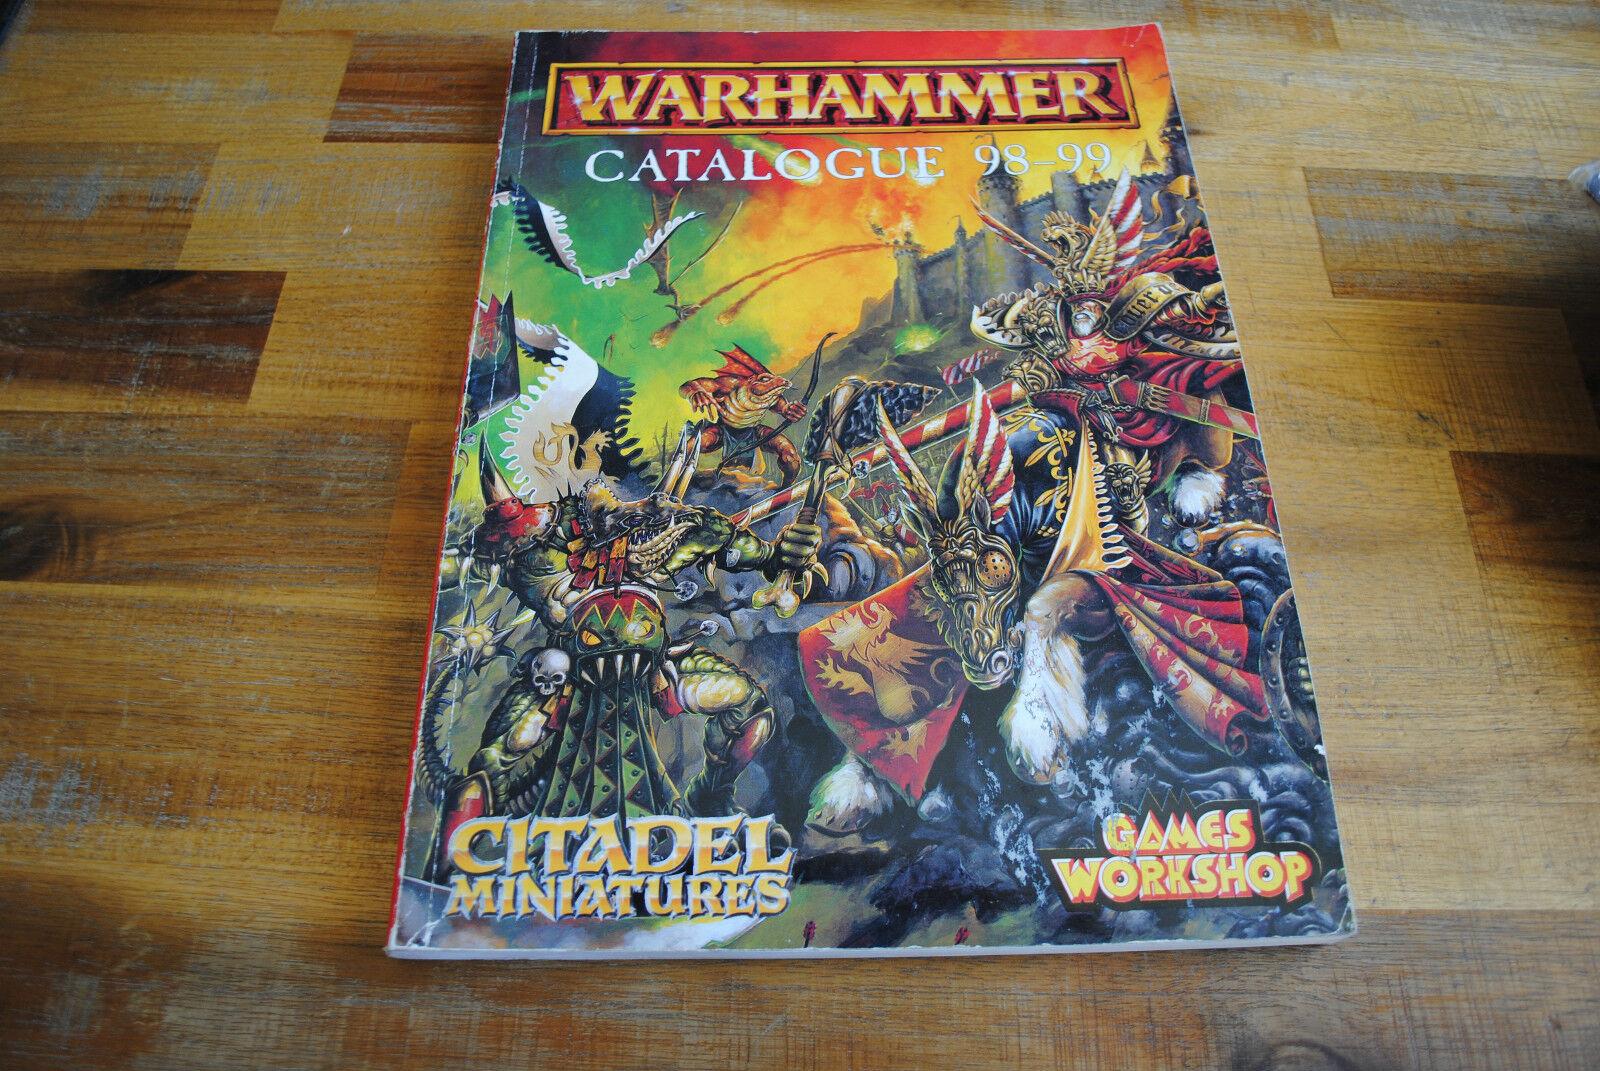 Livre warhammer zitadelle miniaturen katalog 98 - 99 (vo)